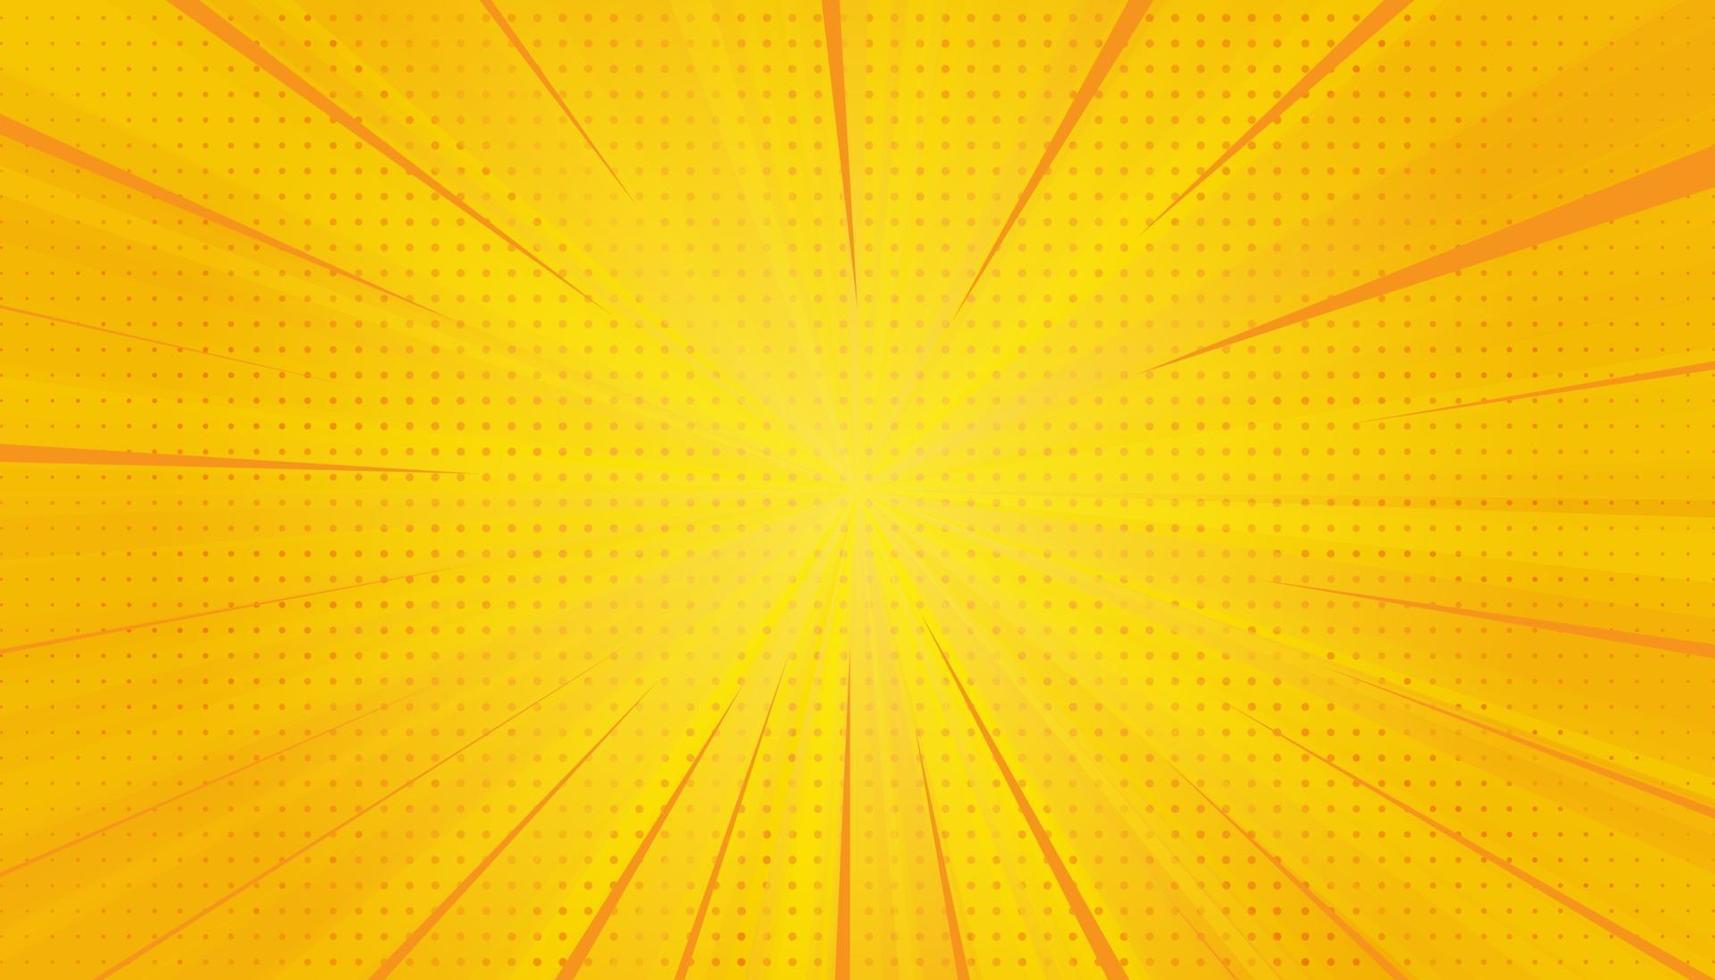 gele strips popart achtergrond. gradiënt halftone pop-art retro stijl vector